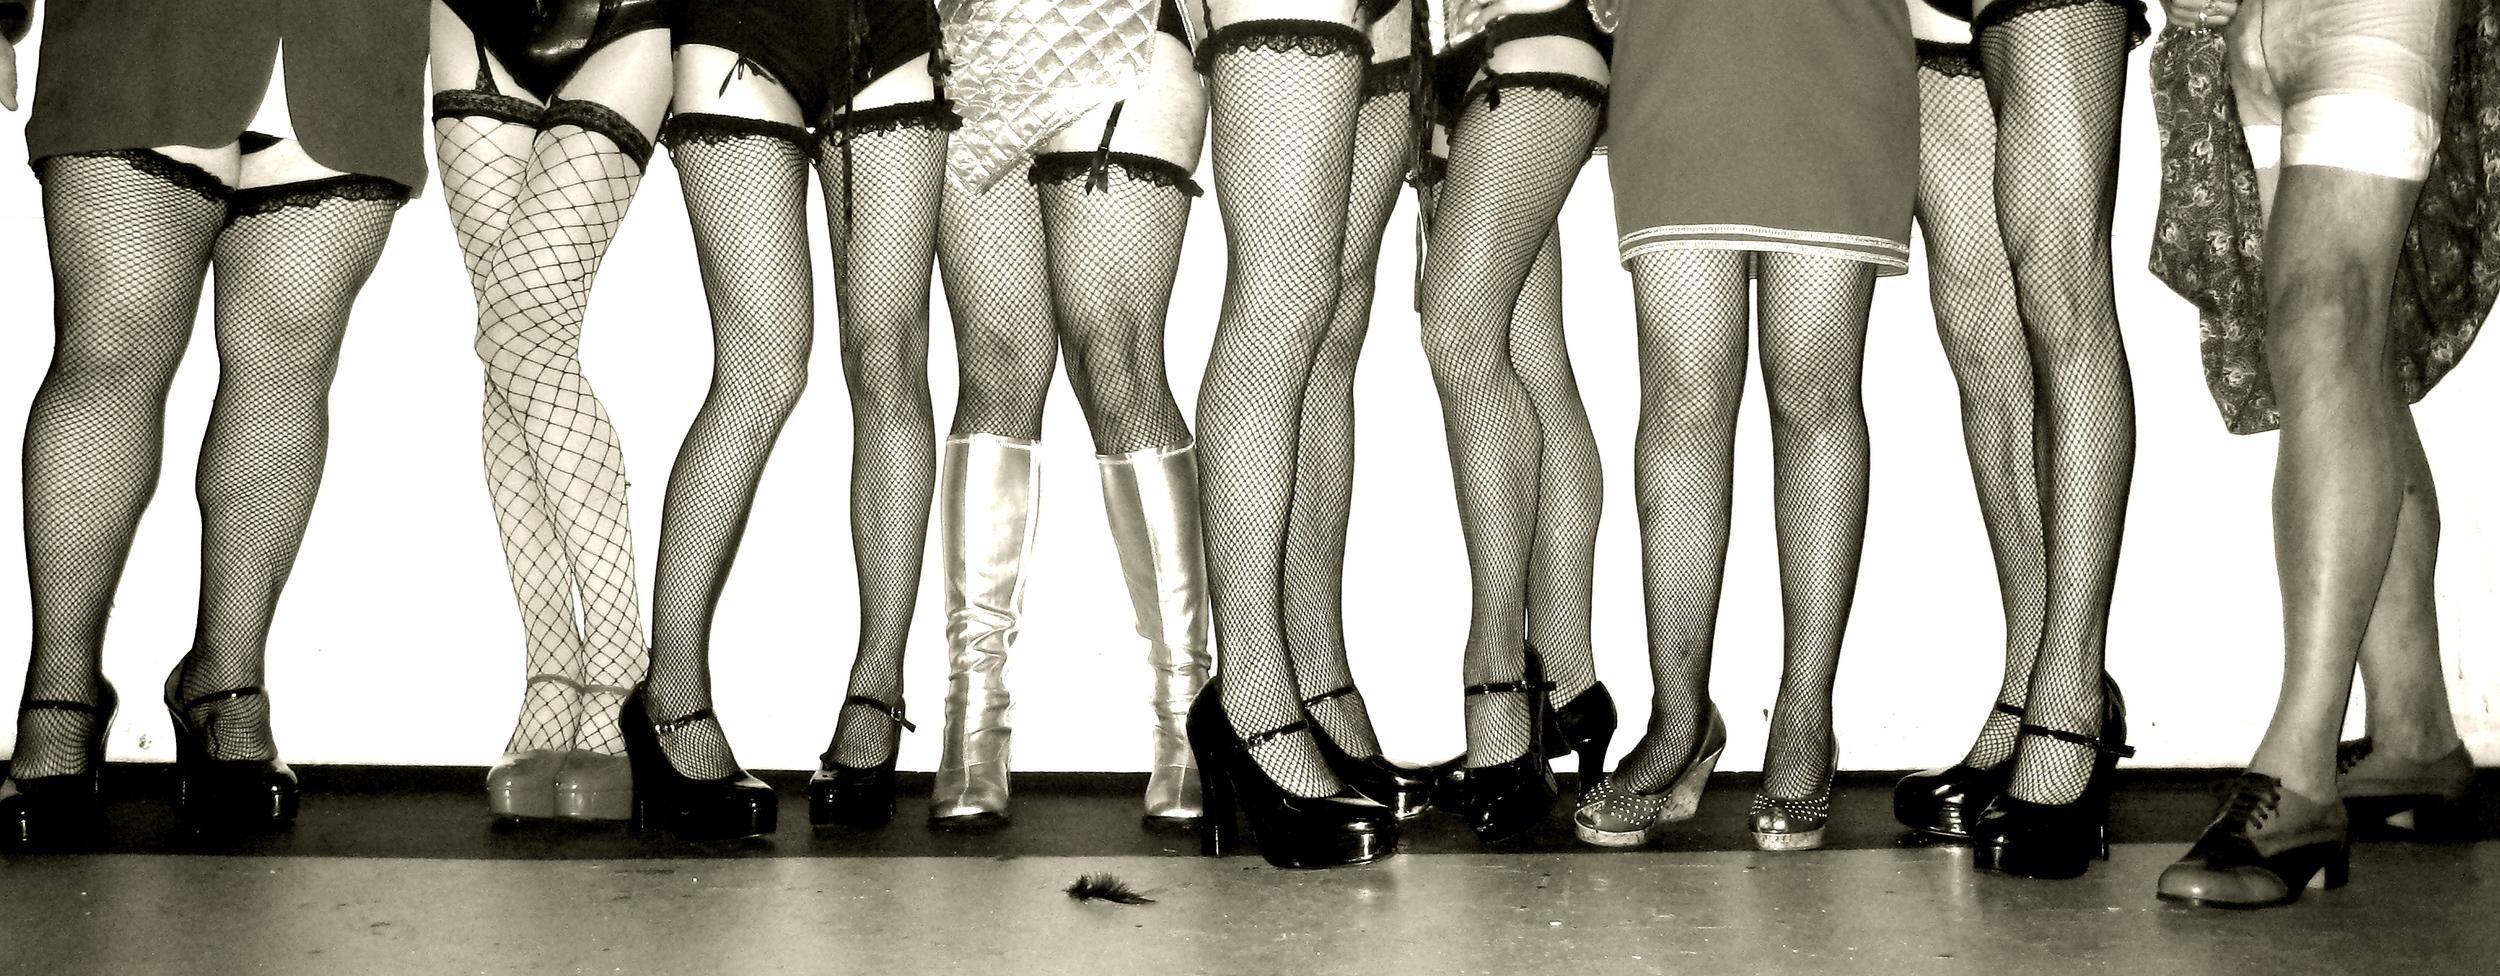 Lomenda's legs in The Rocky Horror Show